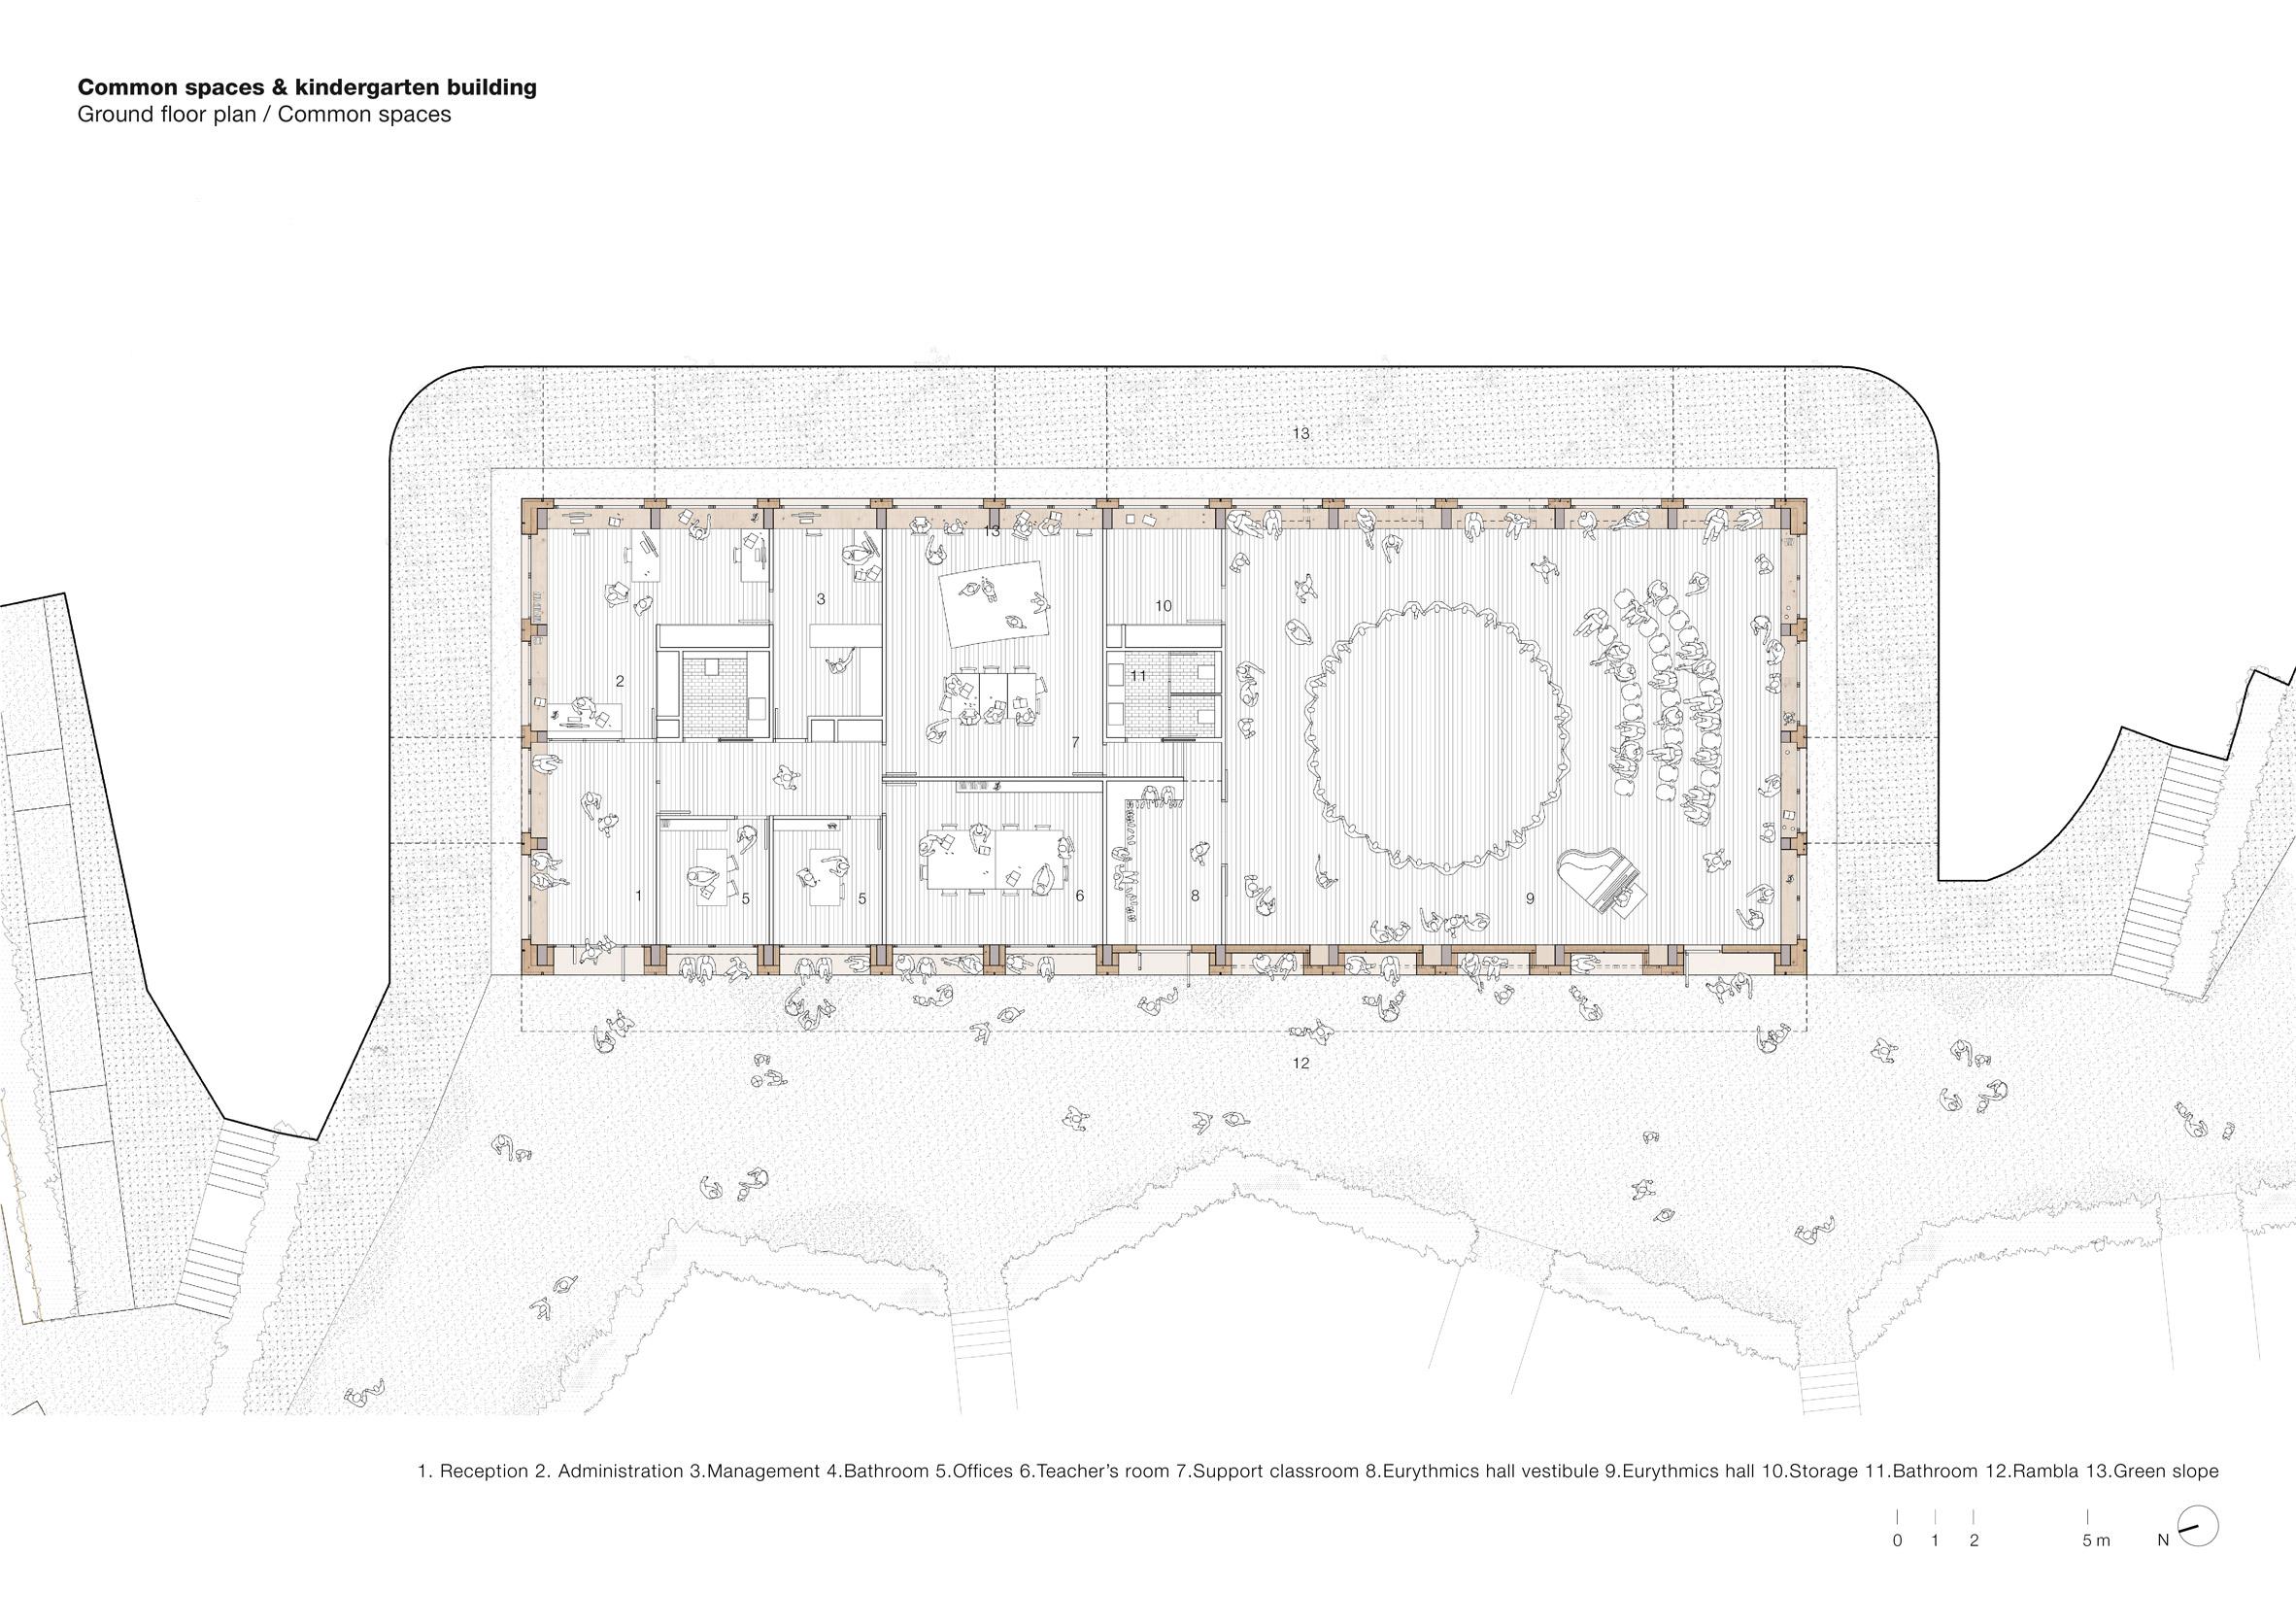 Prefabricated pine panels clad concrete kindergarten near Barcelona